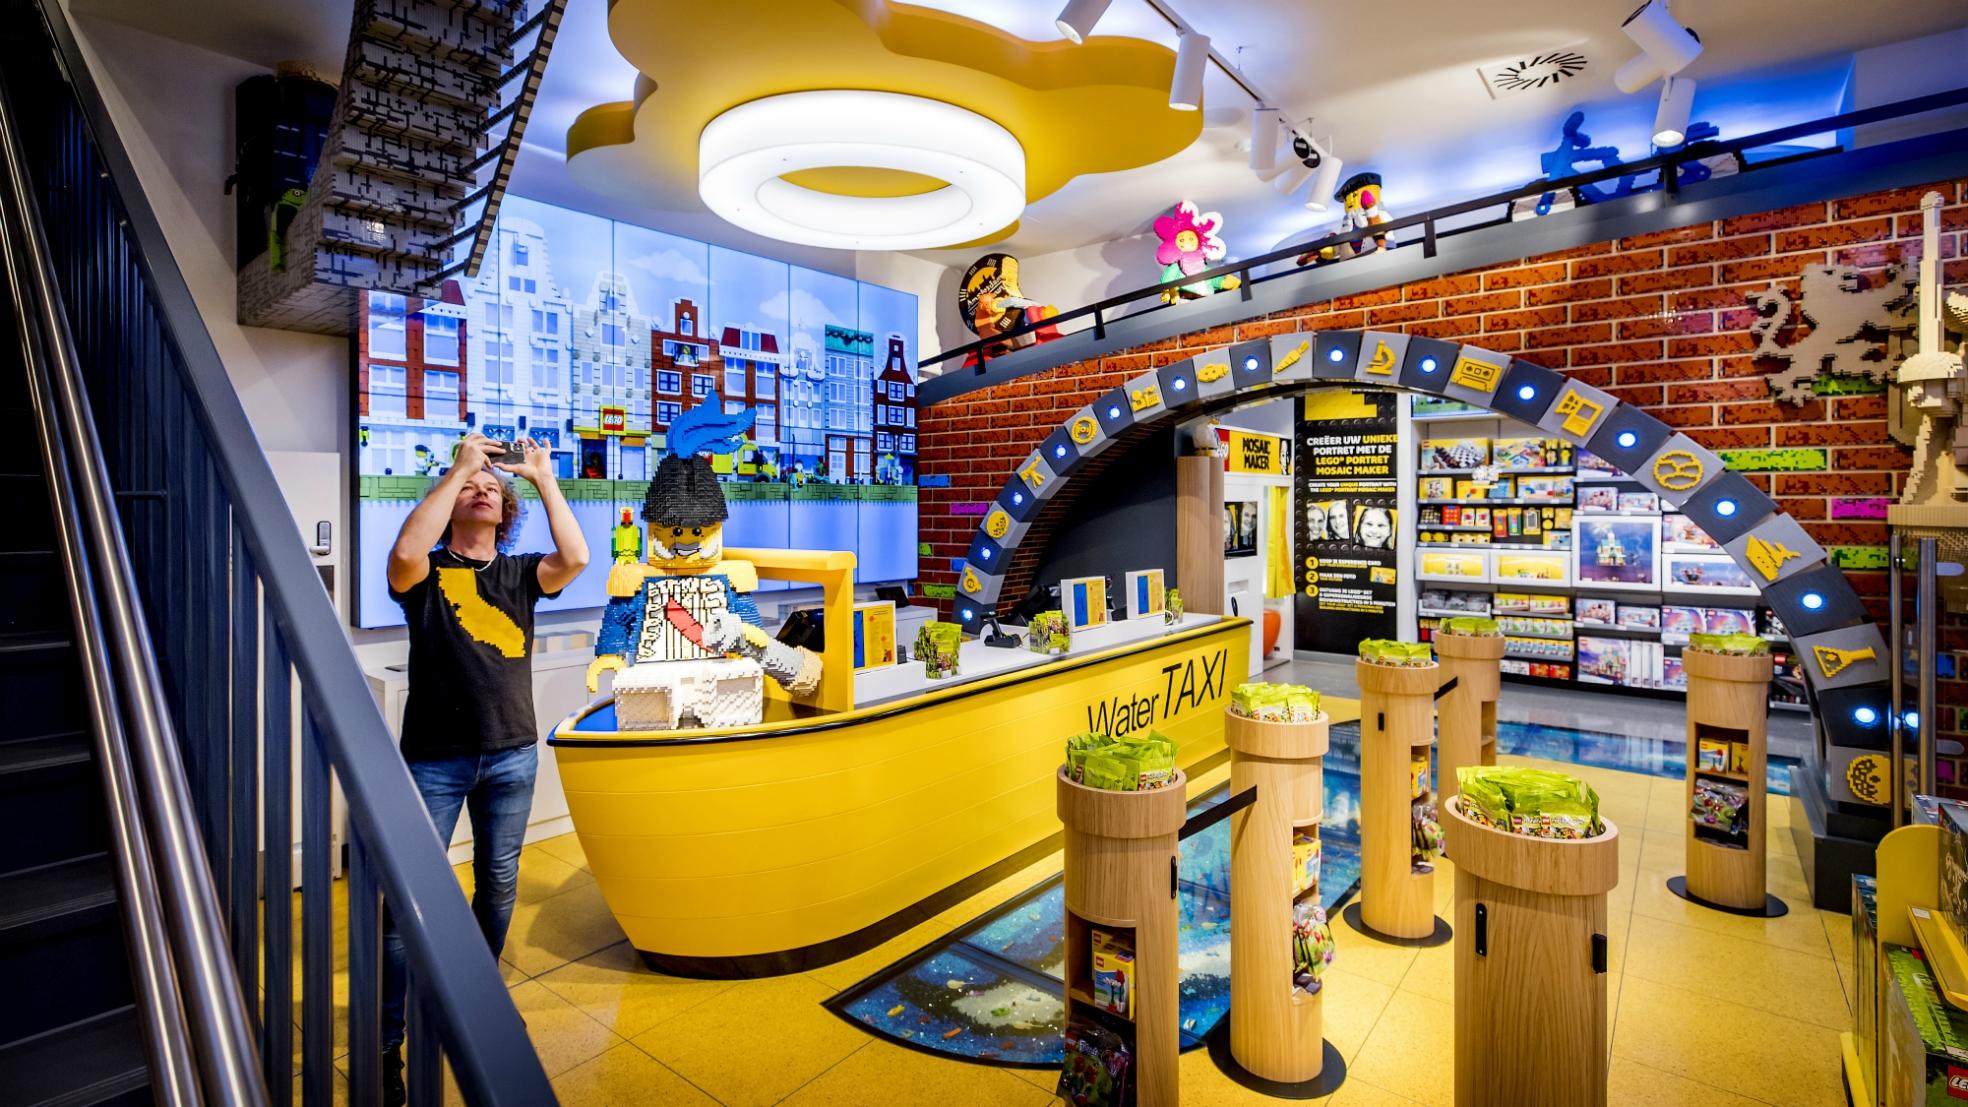 Legowinkel Amsterdam 1